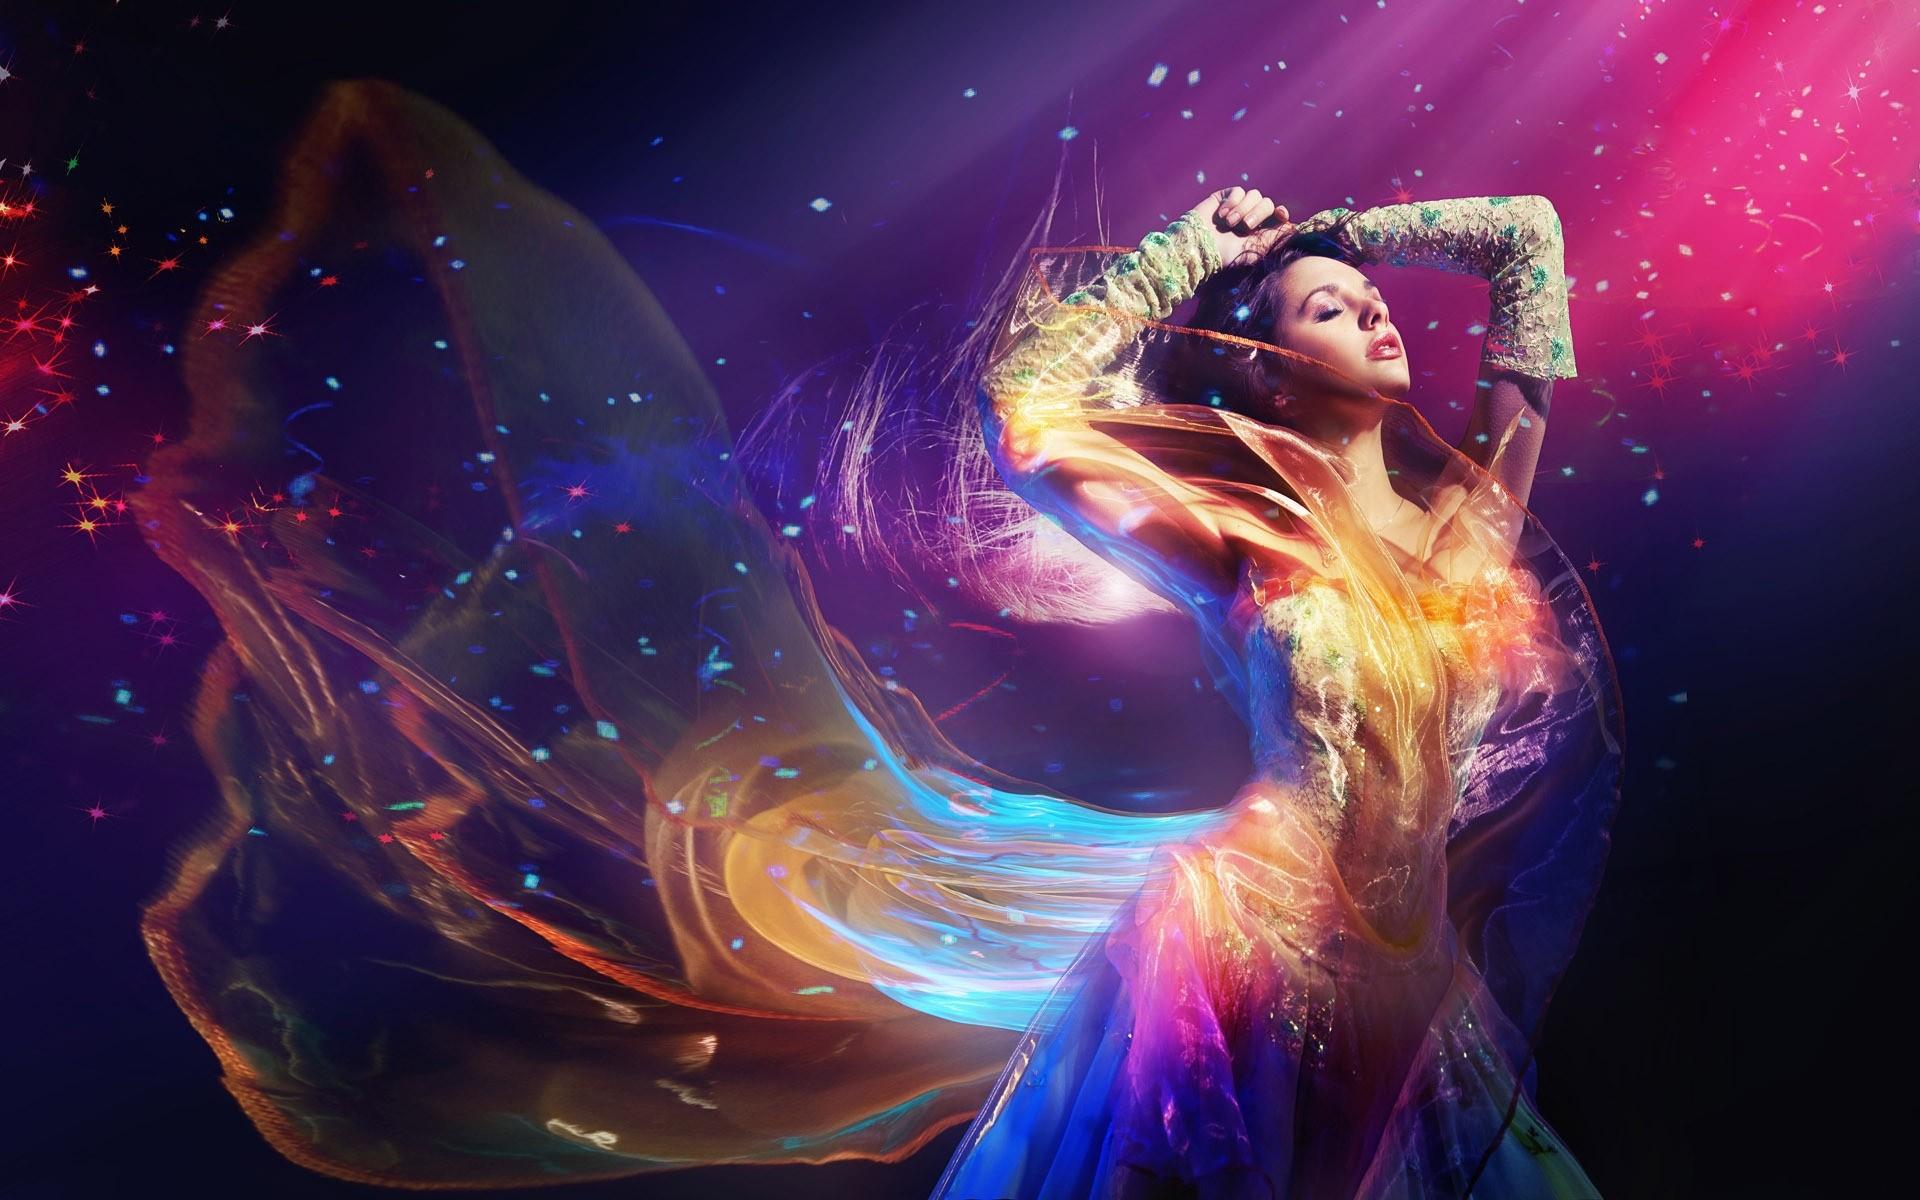 Dance Wallpapers Elegant Dance Myspace Backgrounds Elegant Dance 1920x1200